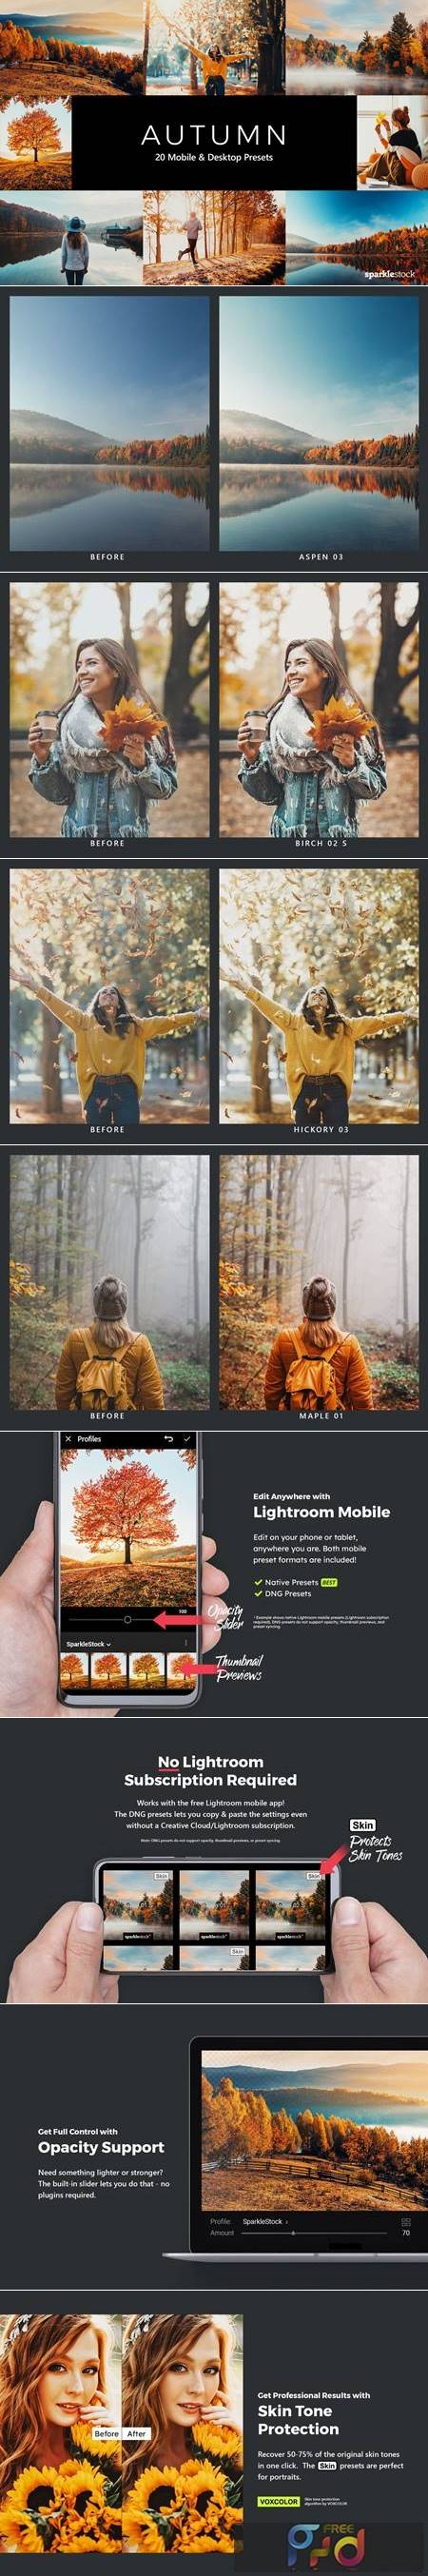 20 Autumn Lightroom Presets & LUTs TYV5HPC 1